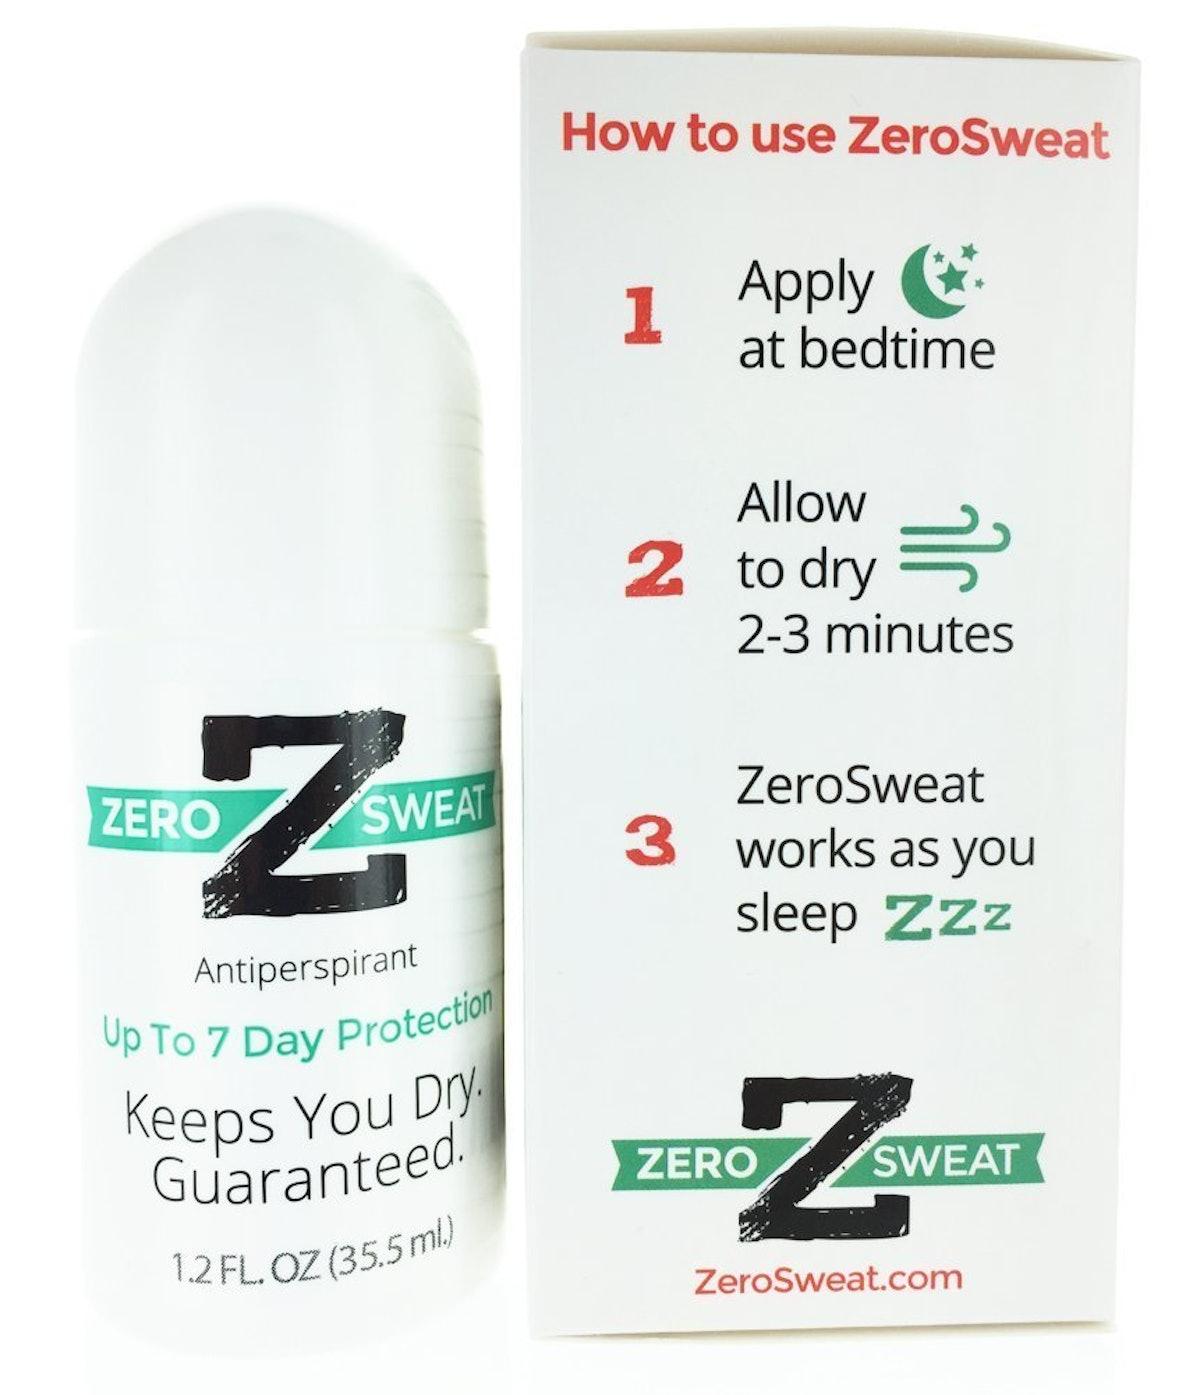 ZeroSweat Antiperspirant